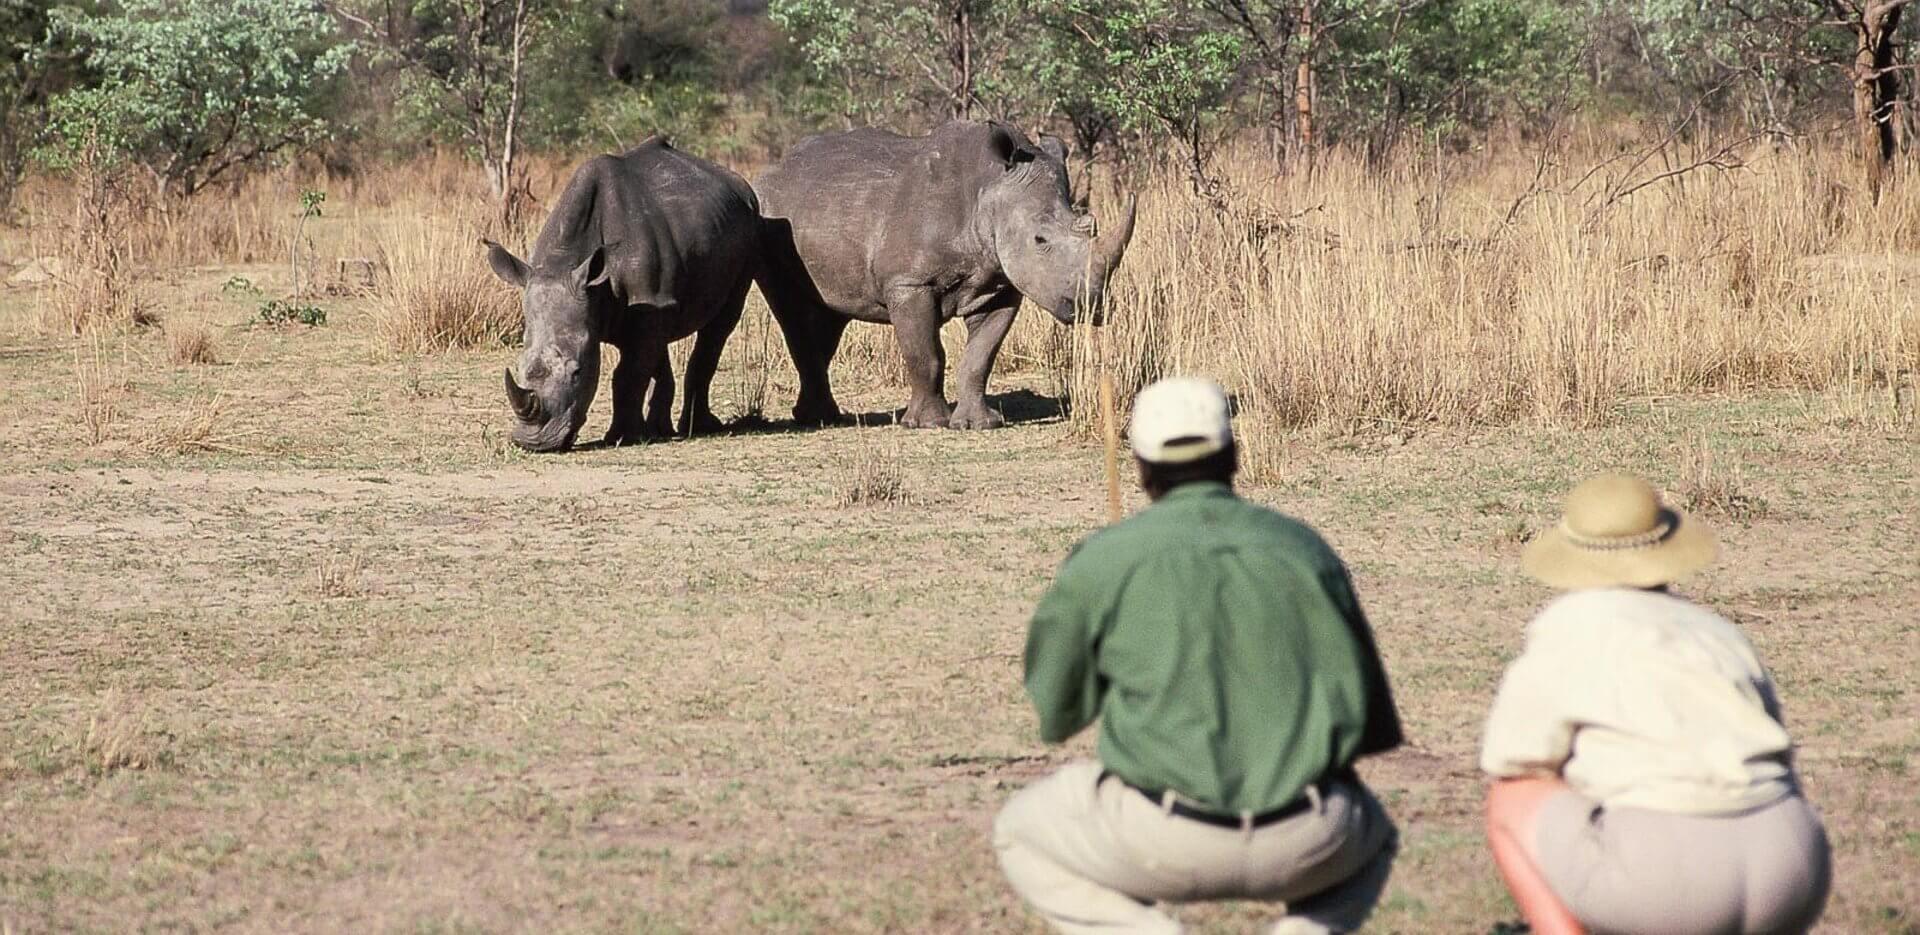 Matobo Hills National Park Zimbabwe